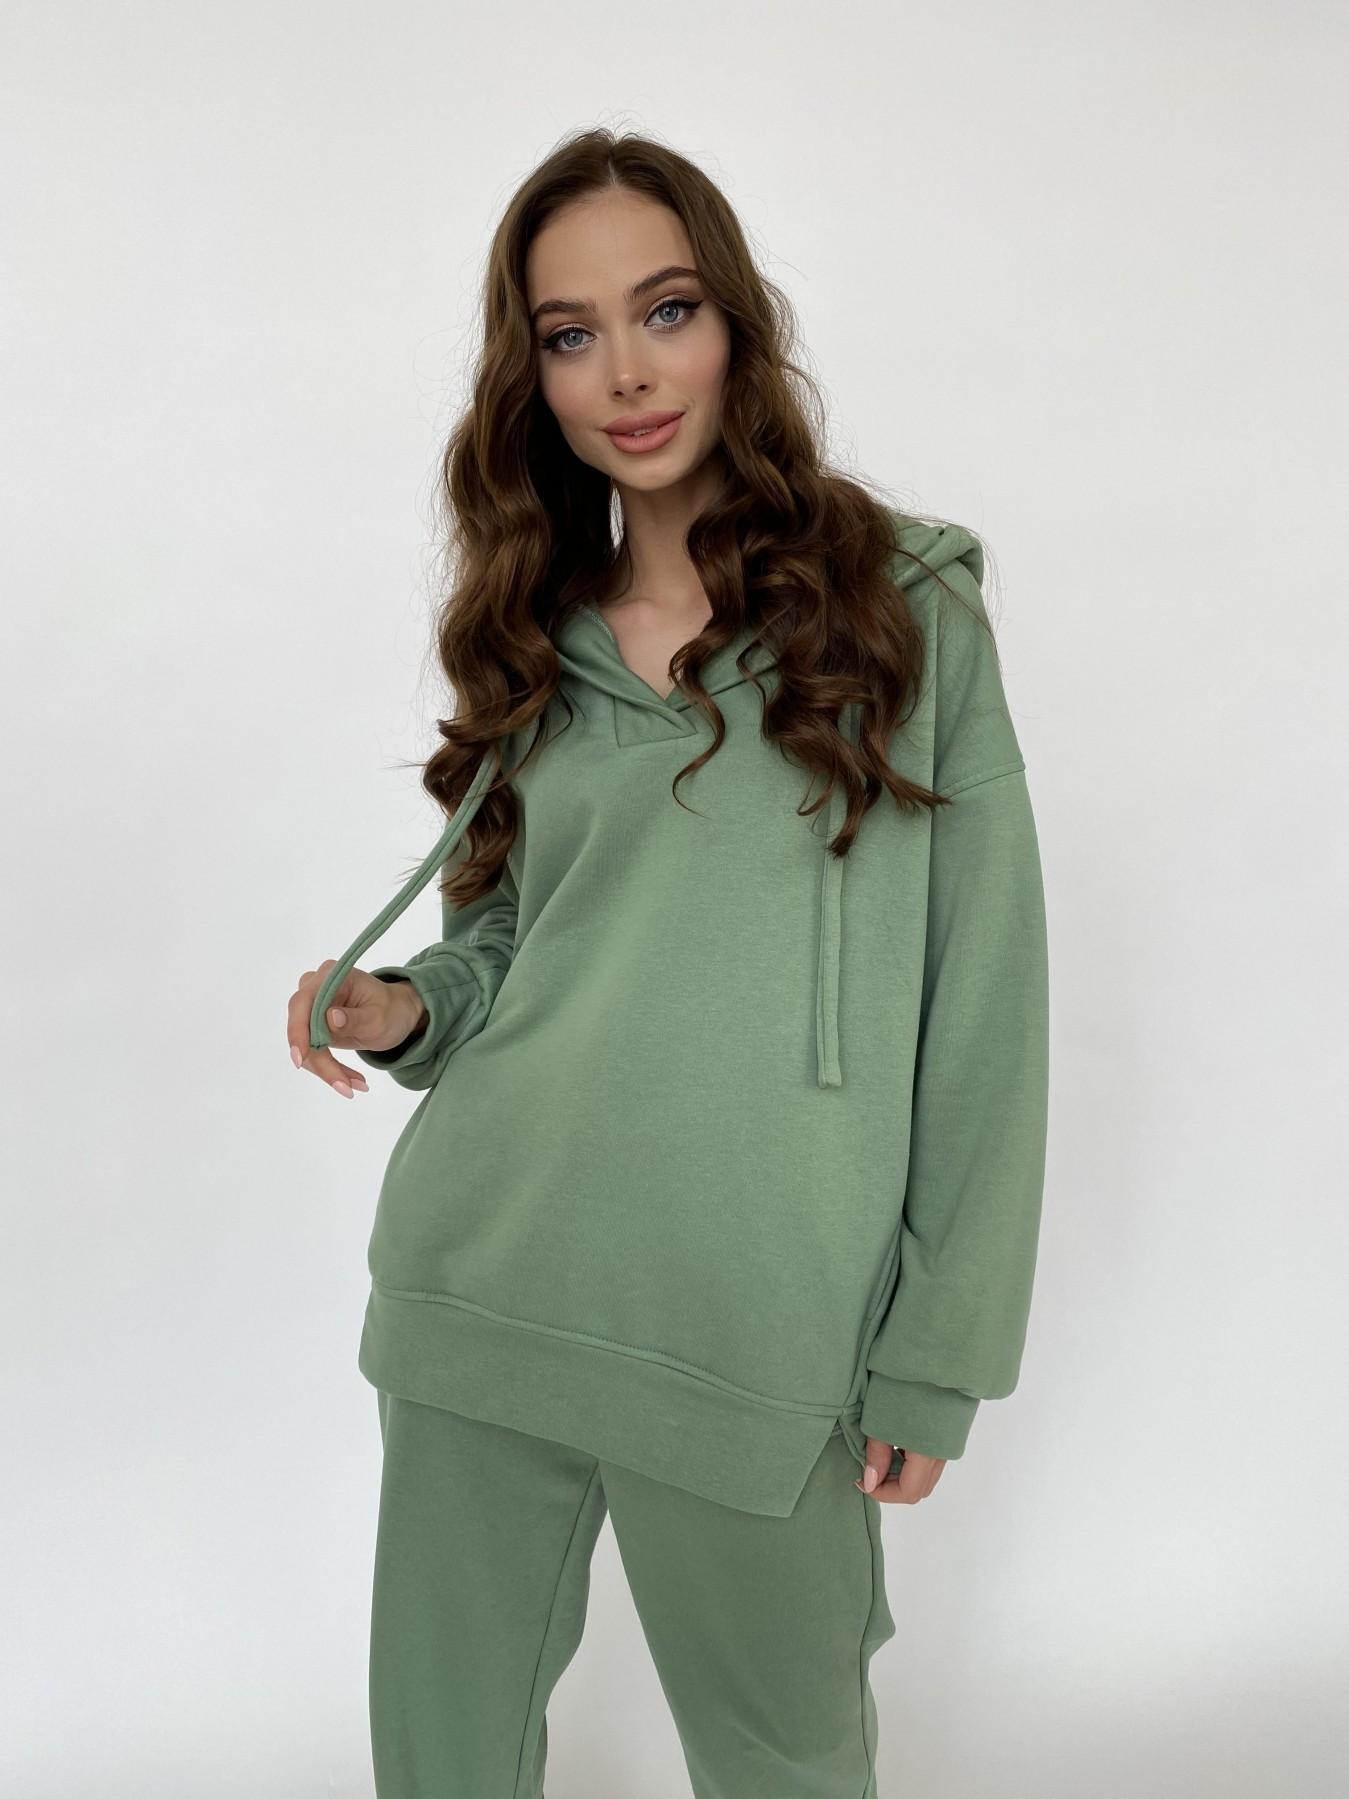 Ярис костюм из 3х нитки 10789 АРТ. 47617 Цвет: Олива Темная - фото 3, интернет магазин tm-modus.ru